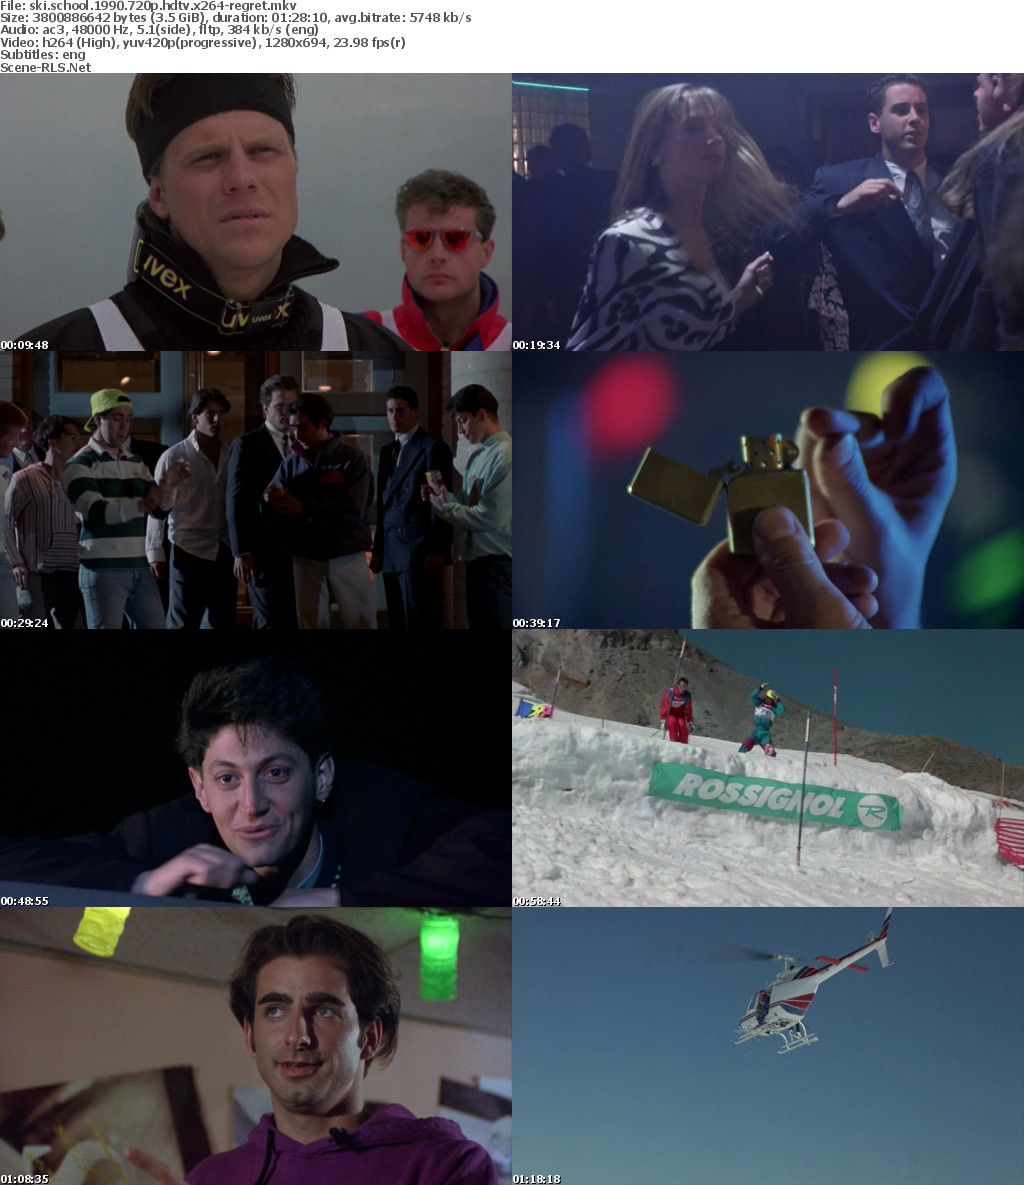 Watch Ski School (1990) Online Free Full Movie HD 123Movies